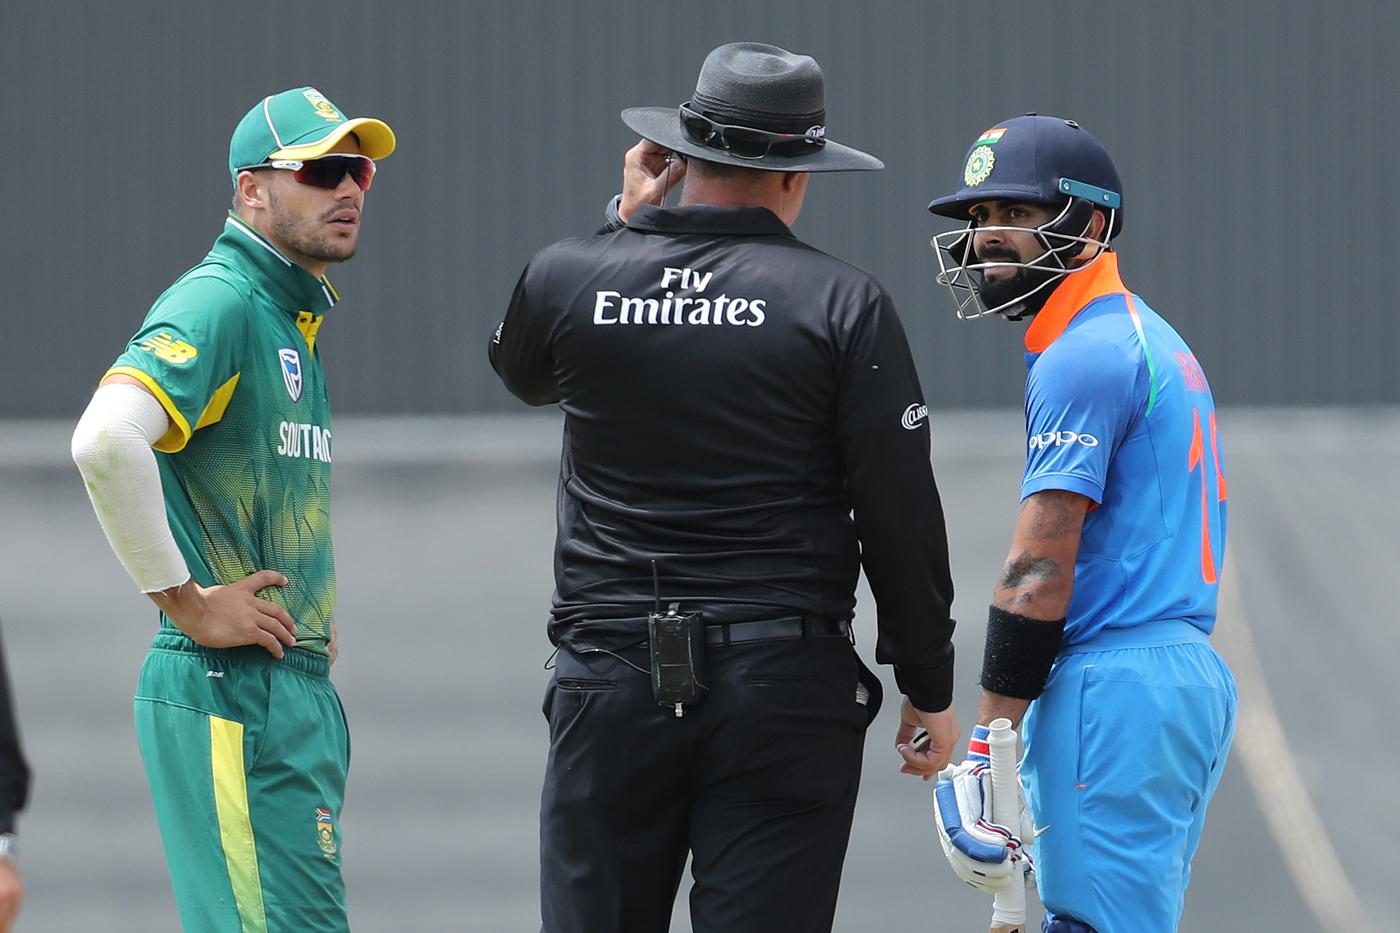 SA vs IND 2018: Virat Kohli's Desperation To Win Games For His Side Is Massive: Aiden Markram